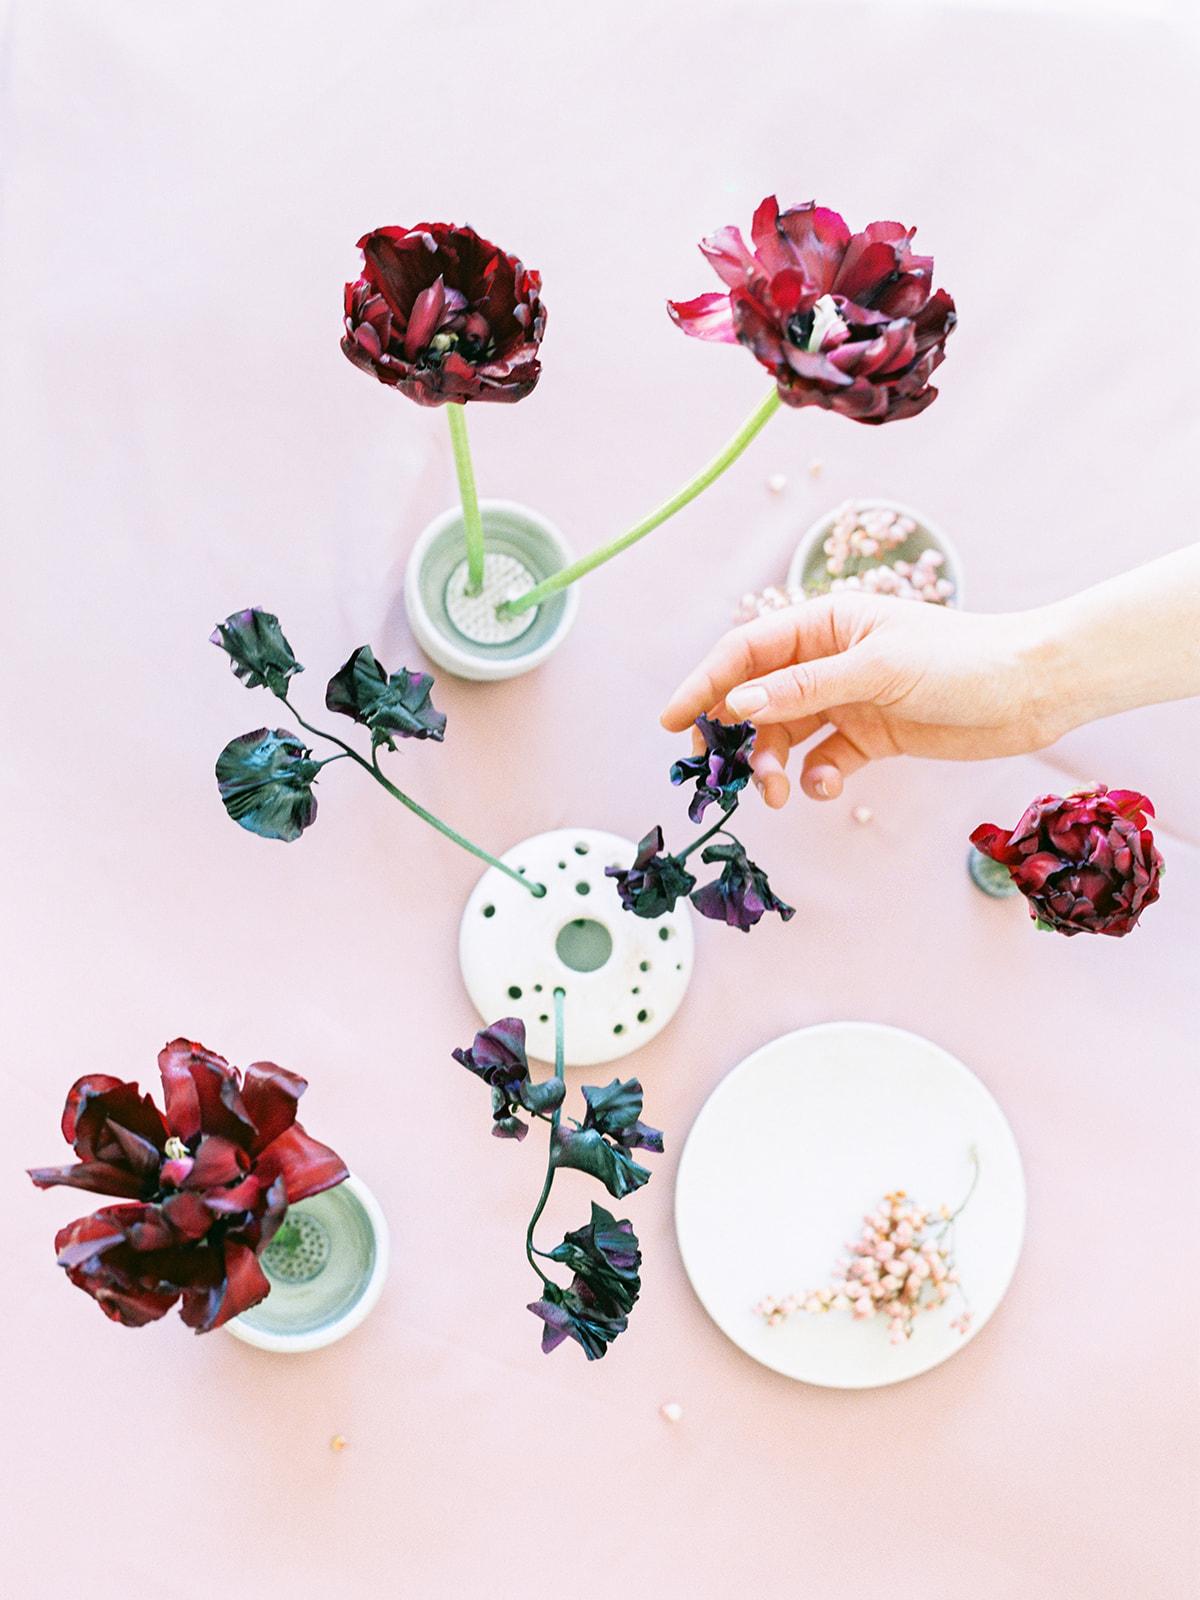 sandra-chau-stylist-fine-art-editorial-shoot-wedding-inspiration-redflowers-unearthingtc-1.jpg